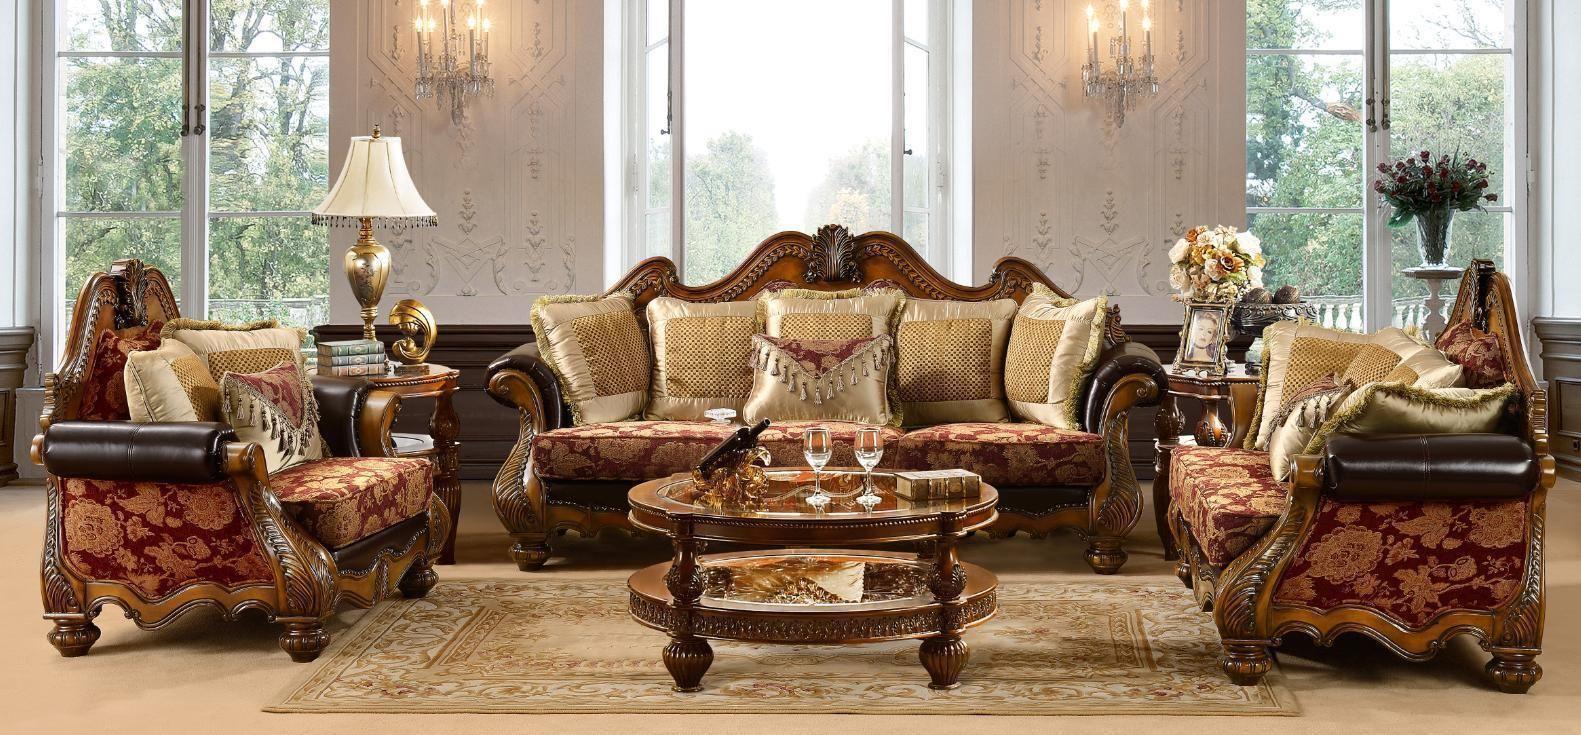 Vendome Victorian Luxury 6pc Living Room Sofa Set in Baroque Gold Patina